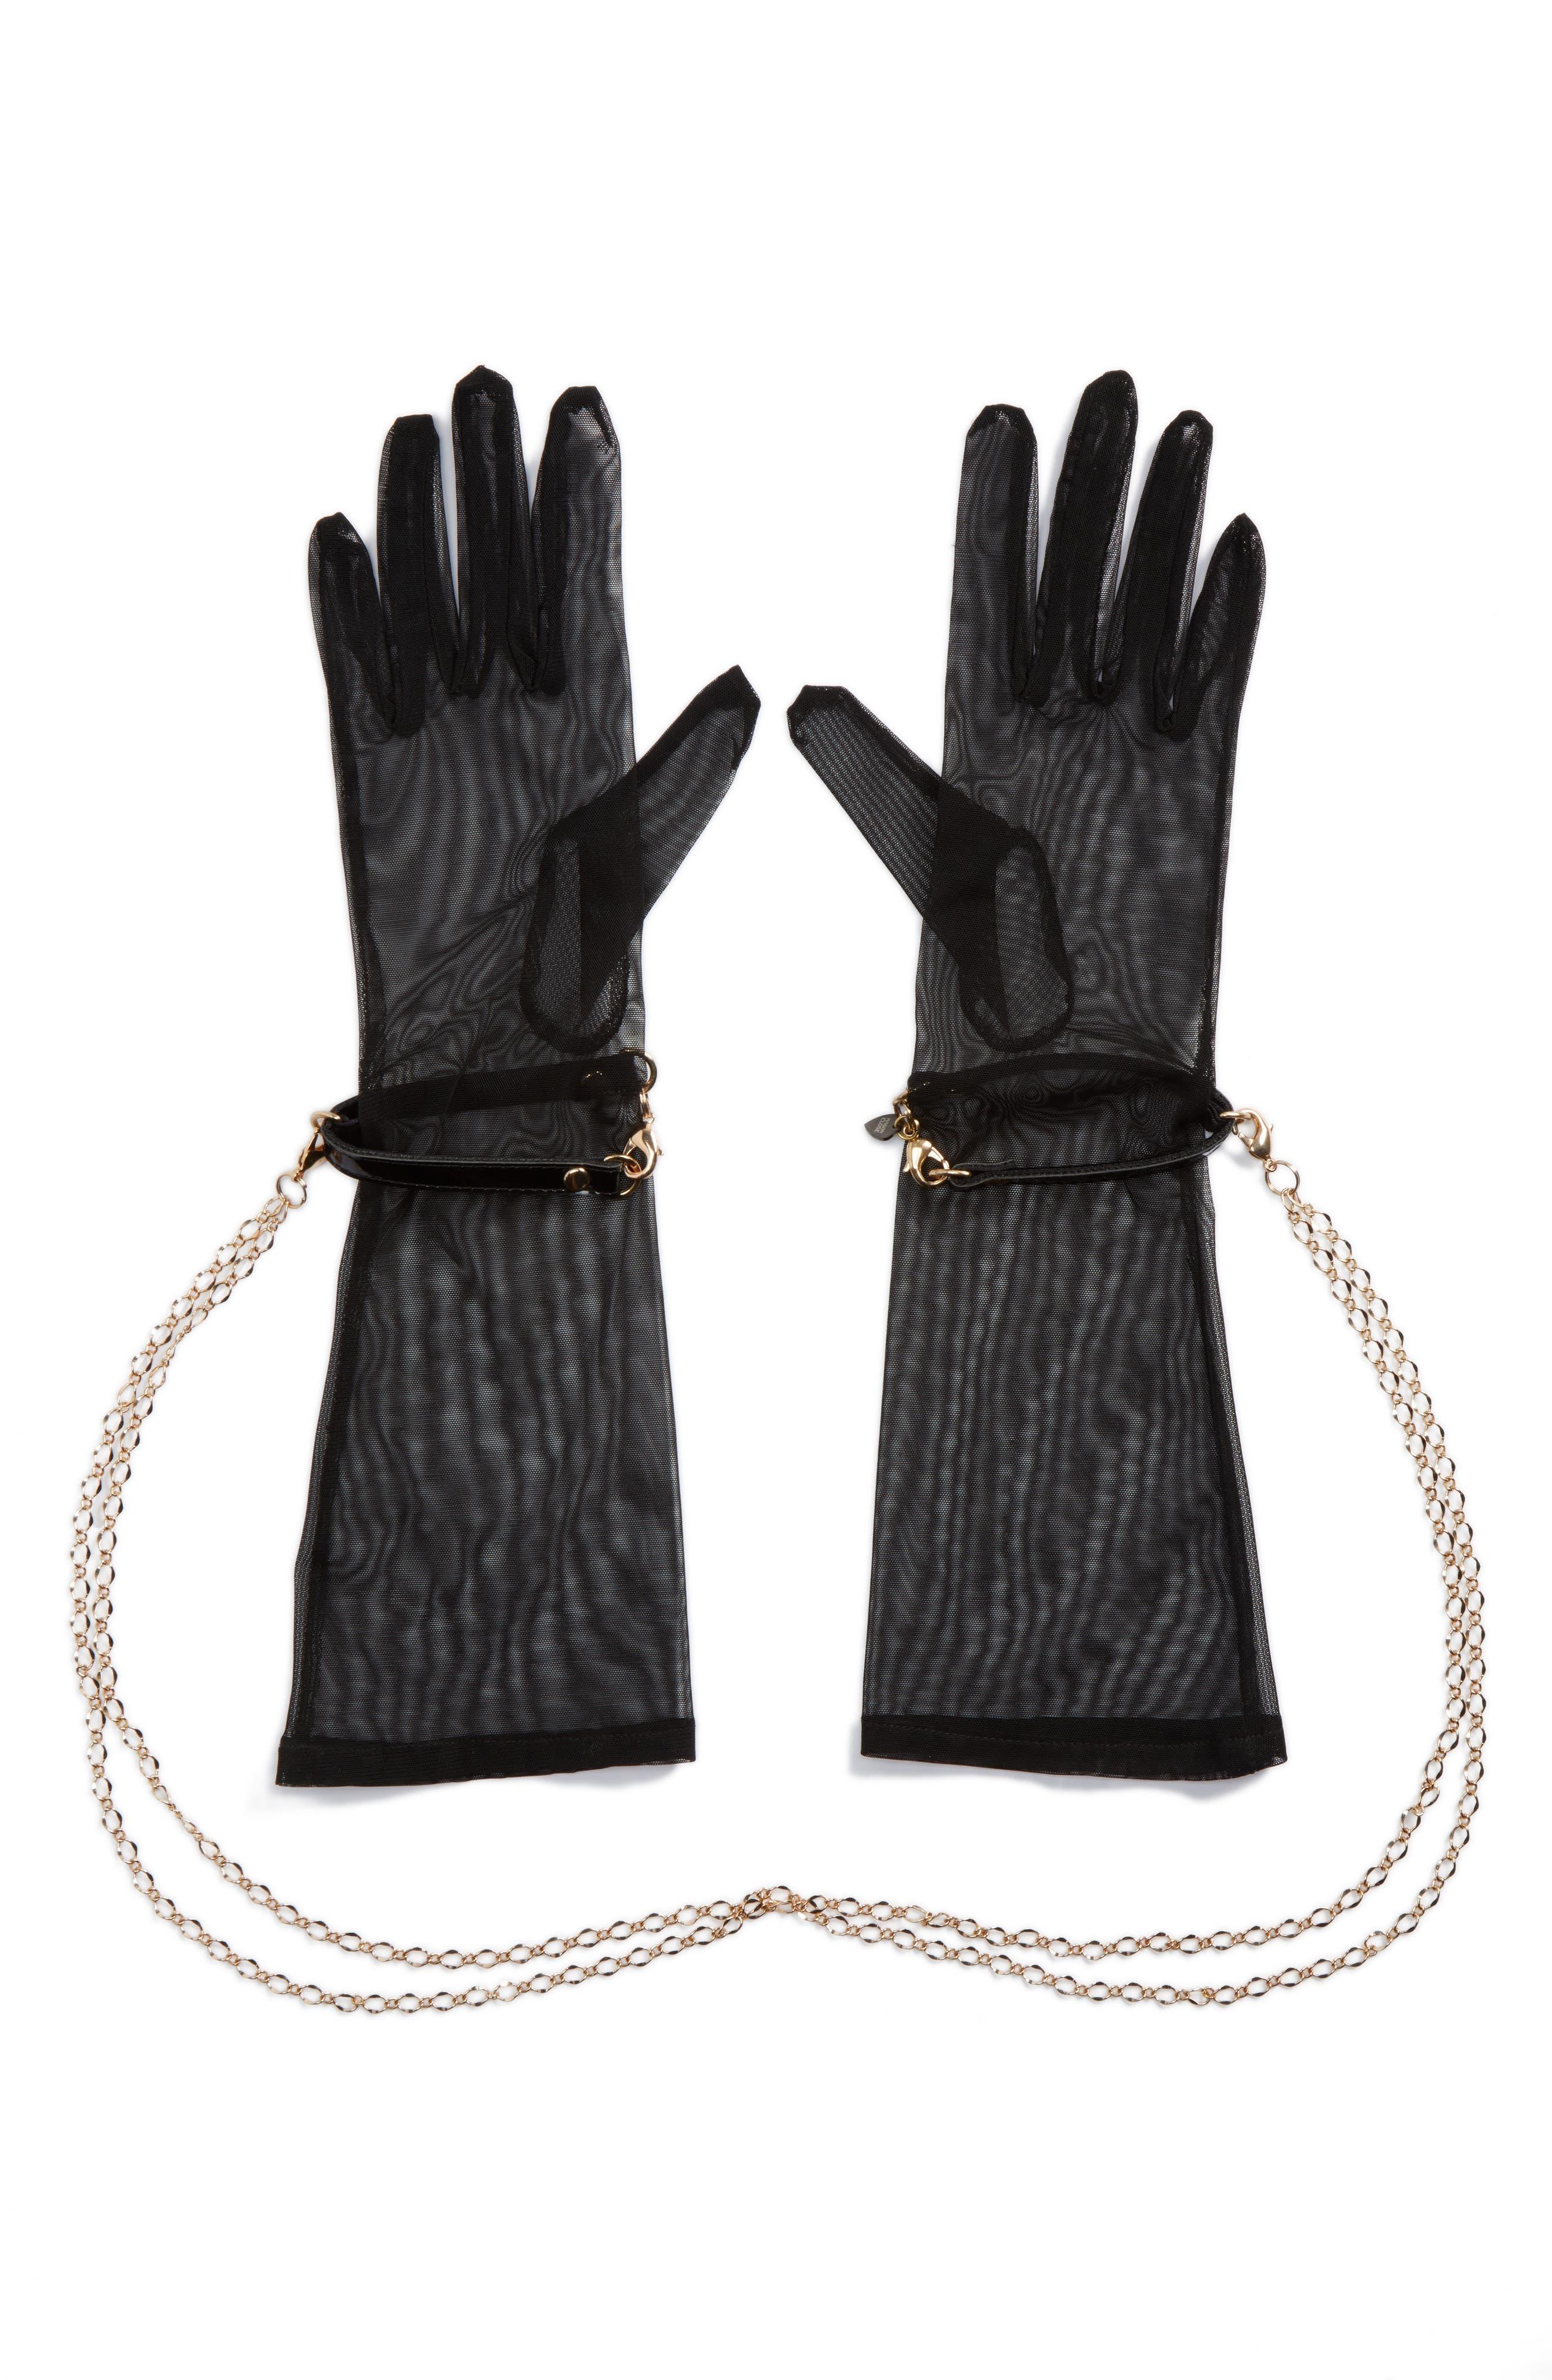 Maison Close x Fräulein Kink Sheer Gloves